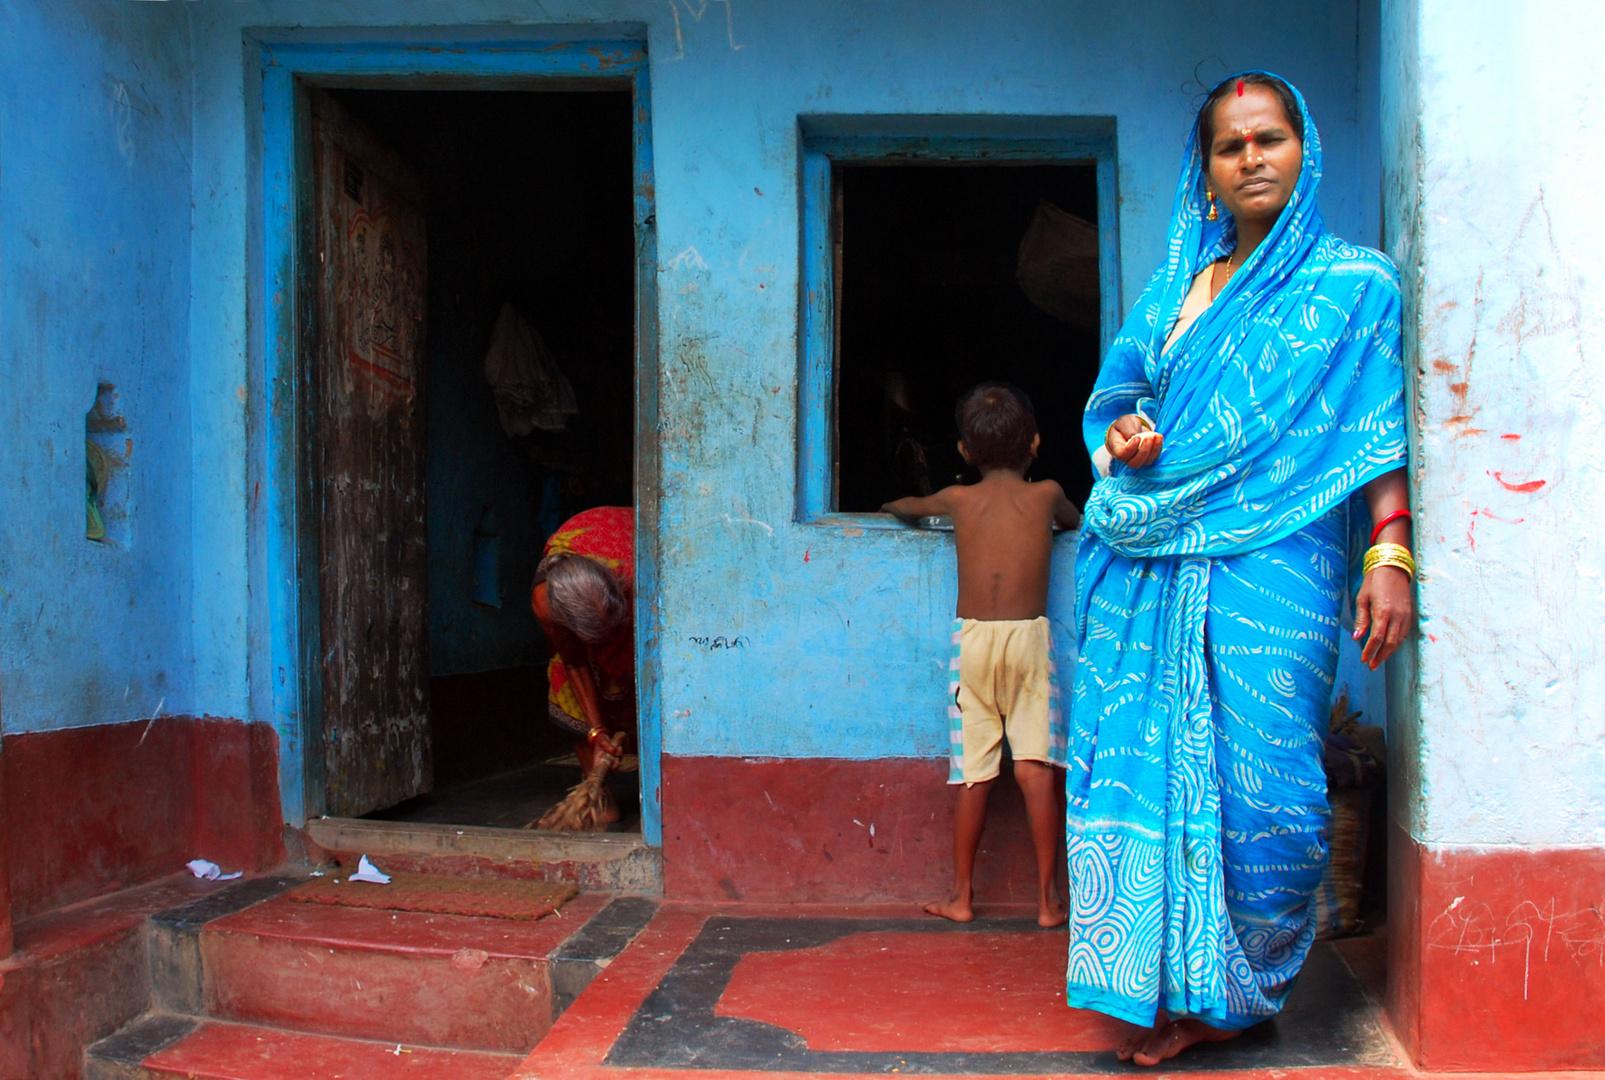 Volti e persone - Raghuraipur - 6 -